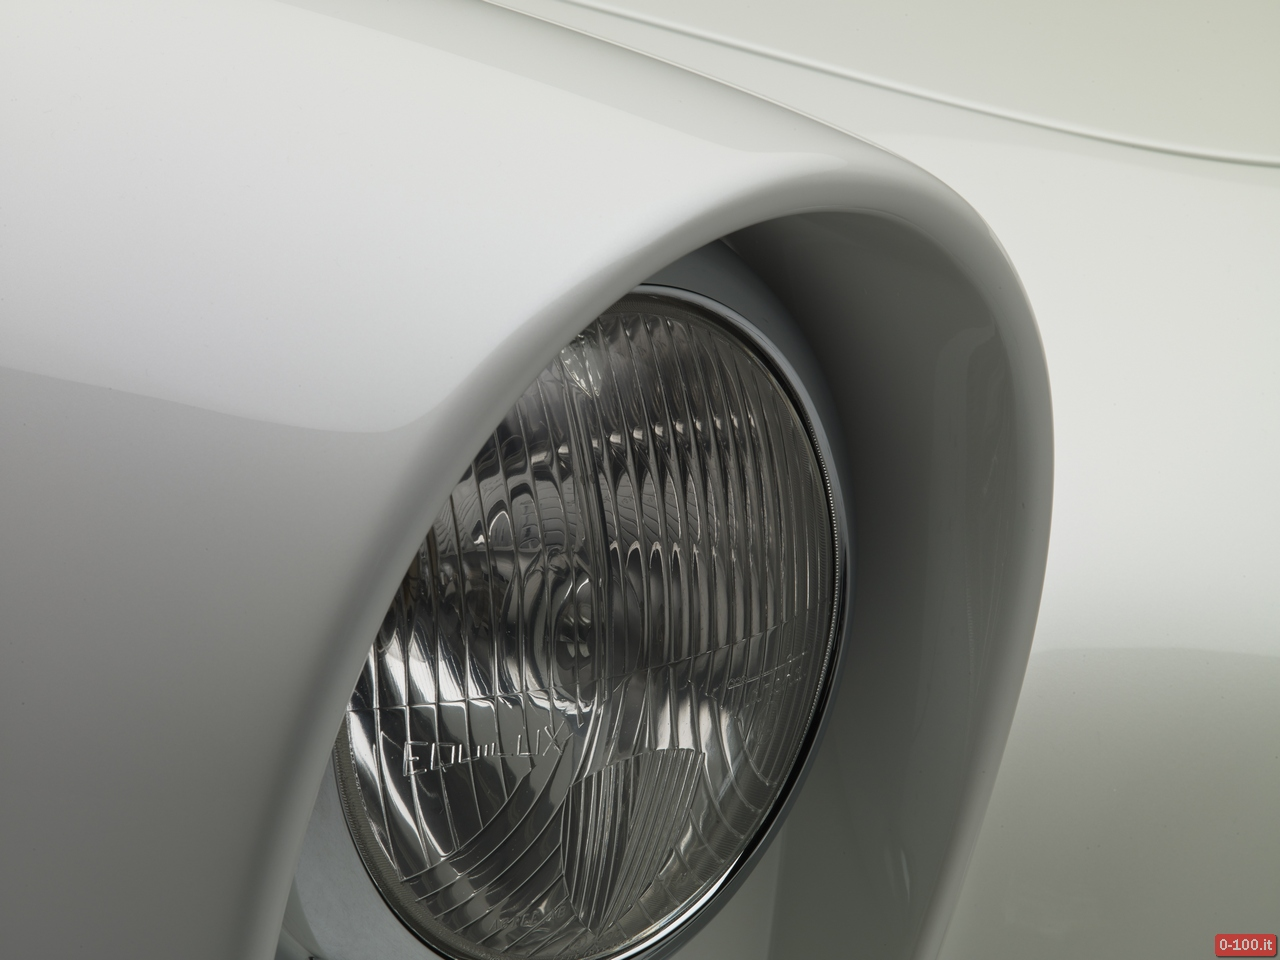 pegaso-z-102-berlinetta-serie-ii-by-carrosserie-j-saoutchik-rm-auctions_0-100_12